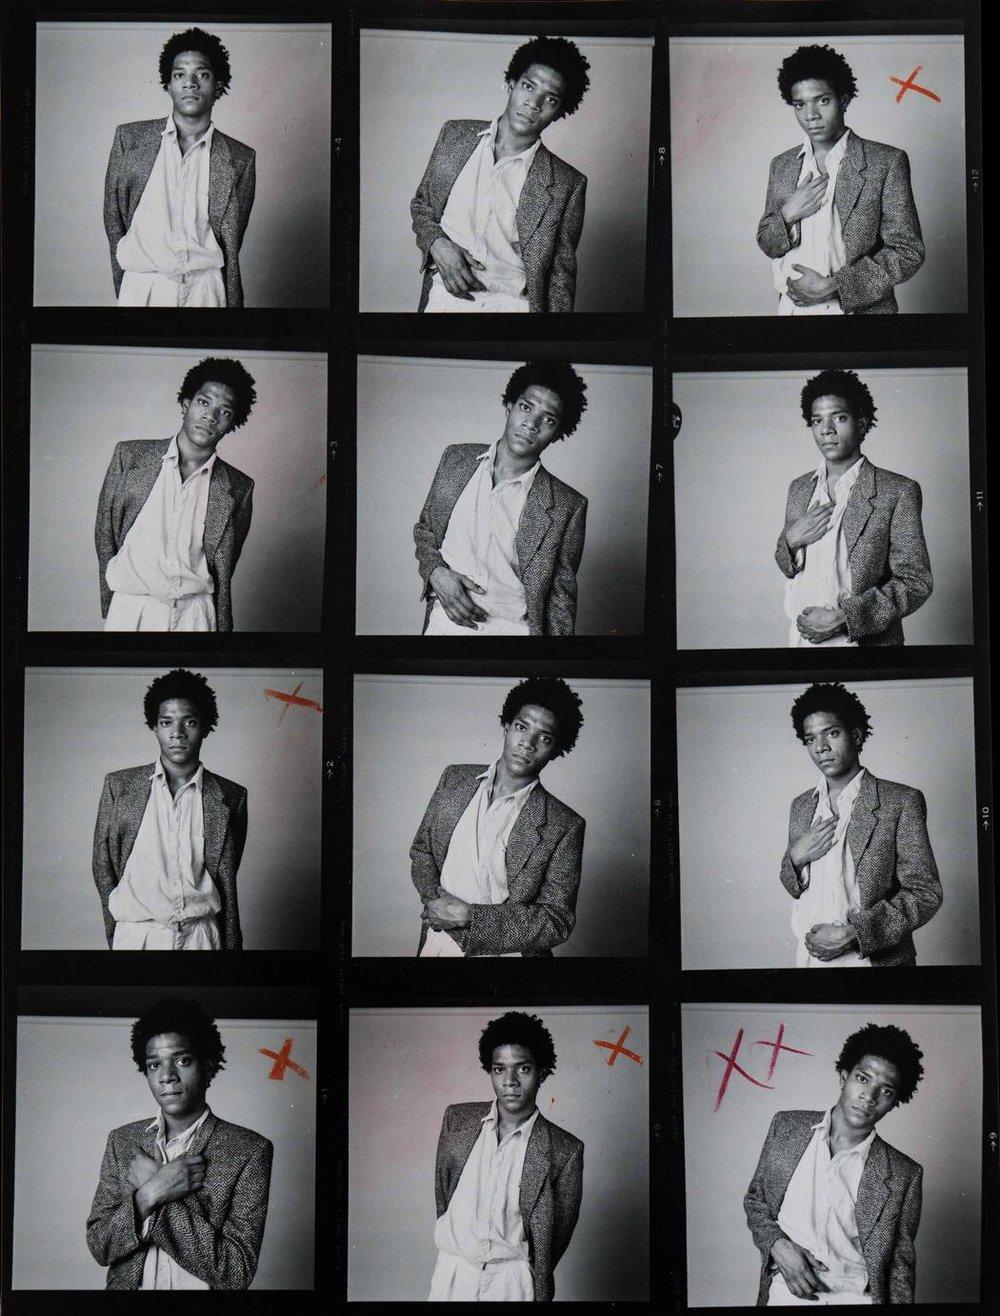 Richard-corman-basquiat-profile-photo-0.jpg